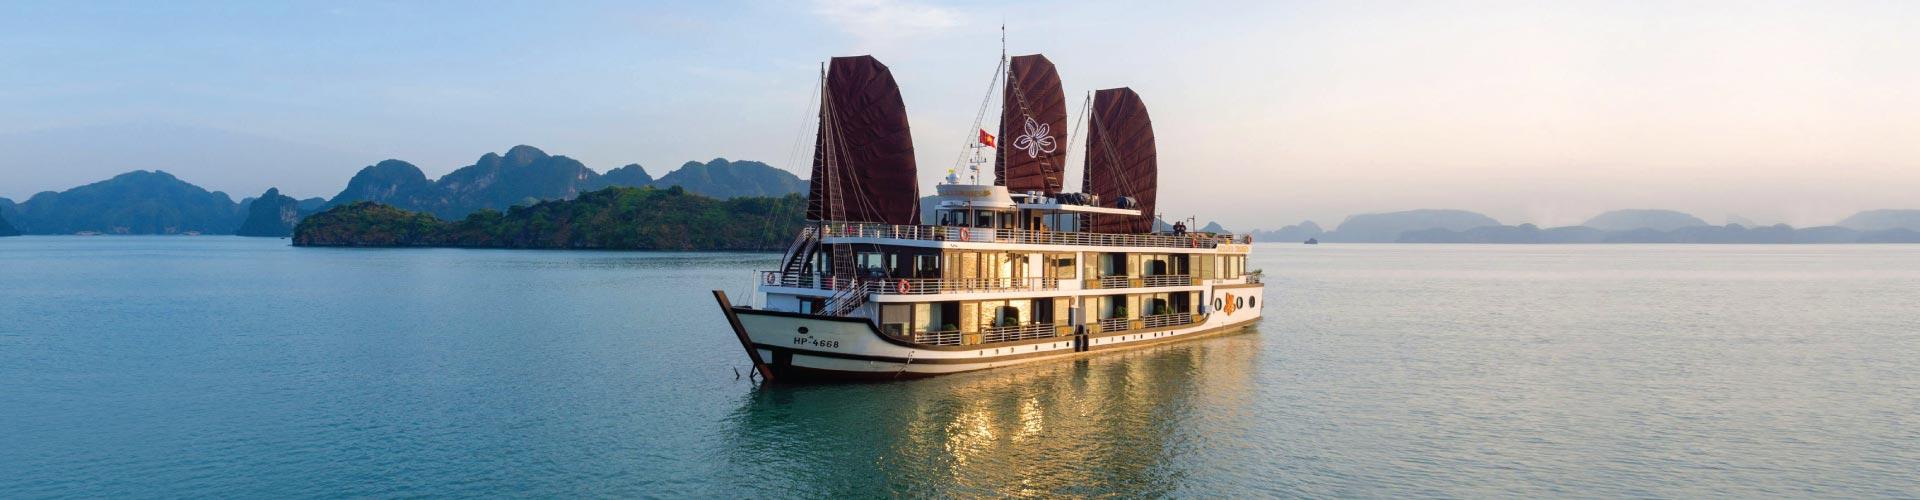 Hanoi & Ha Long Bay + Ninh Binh (Overnight Cruise)